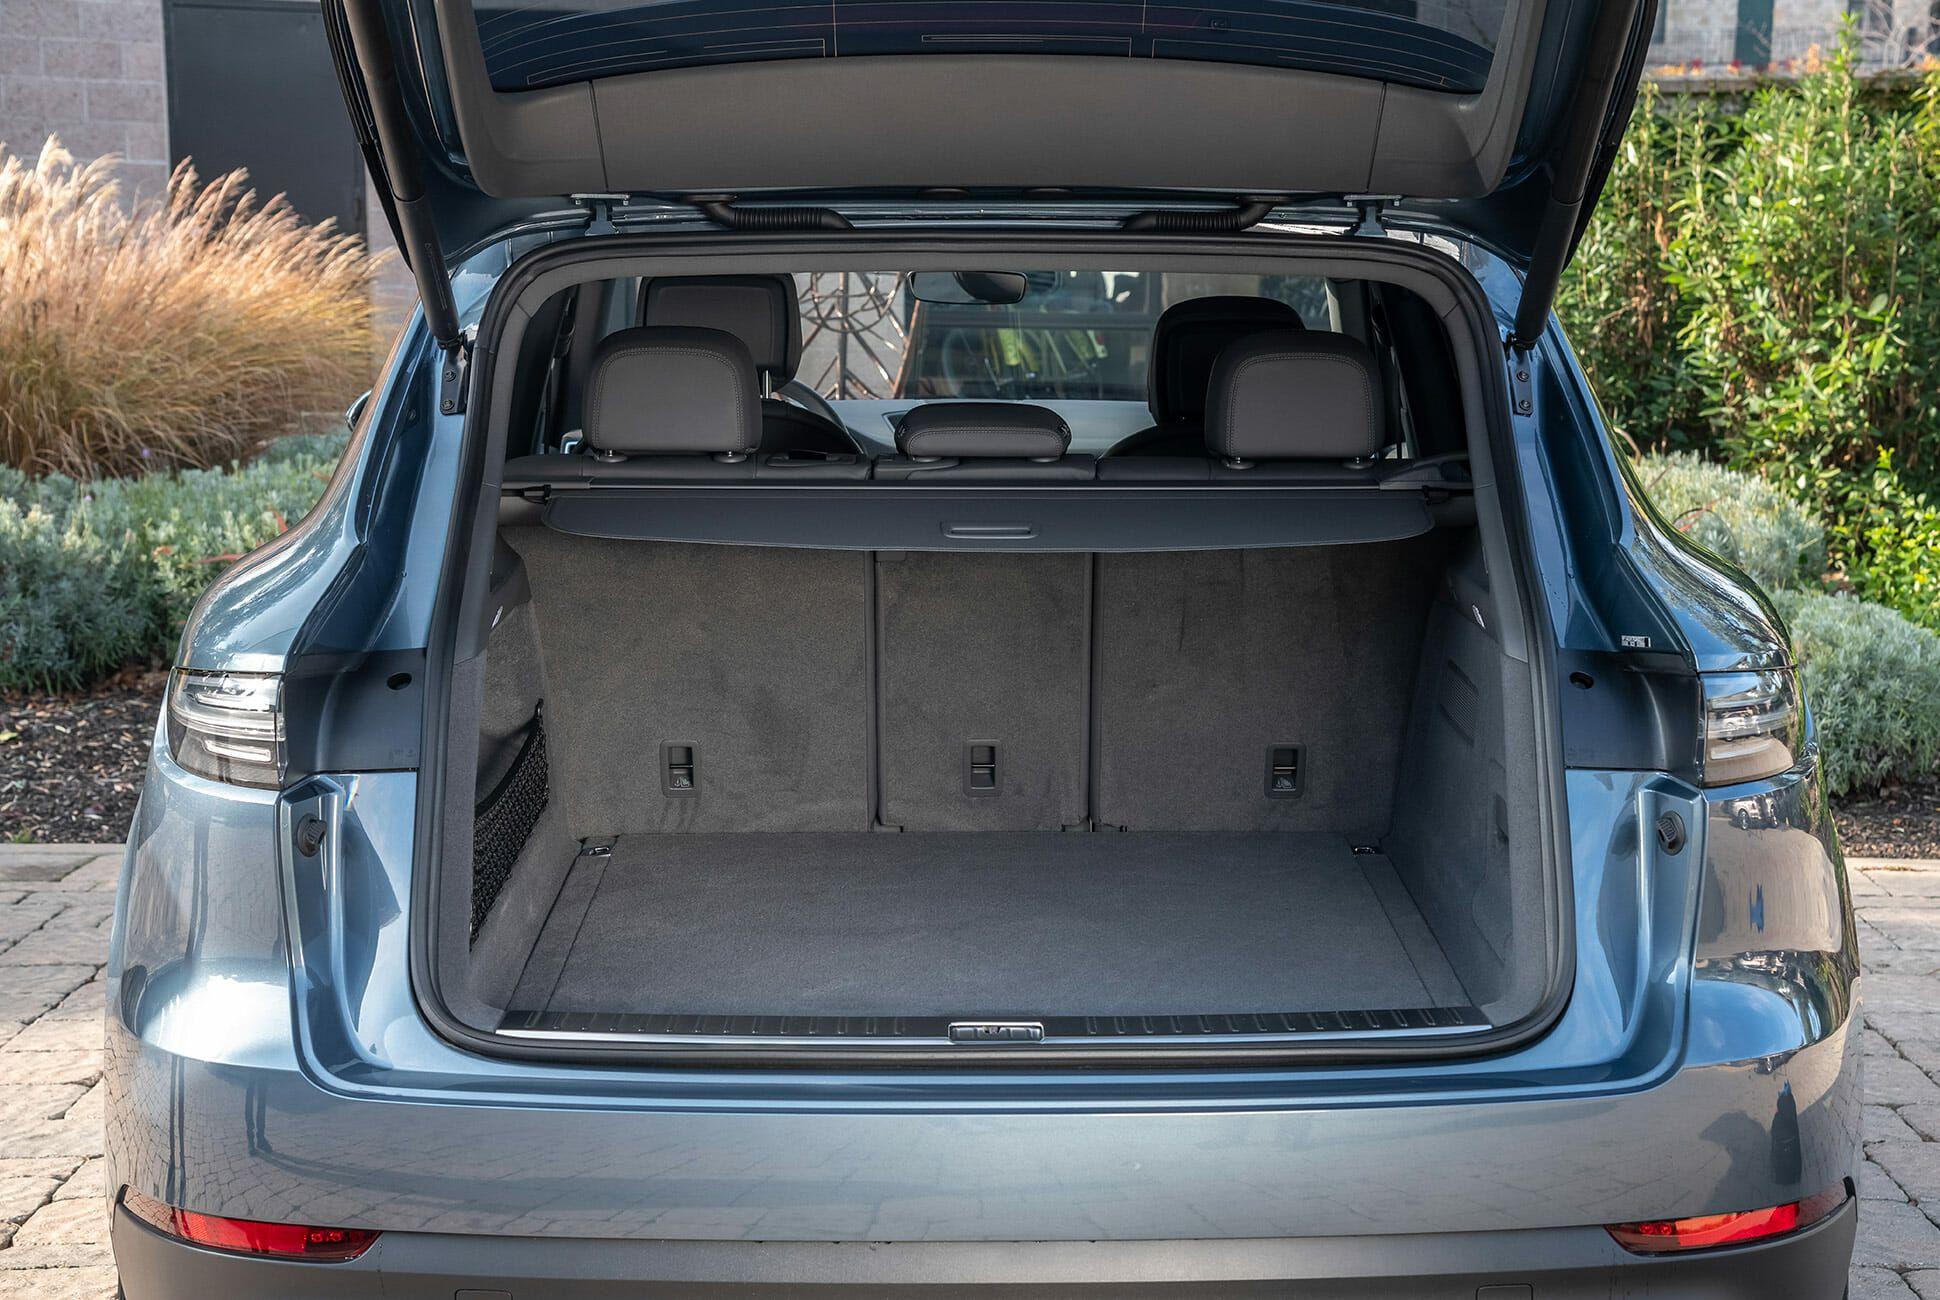 Porsche-Cayenne-Review-gear-patrol-slide-8